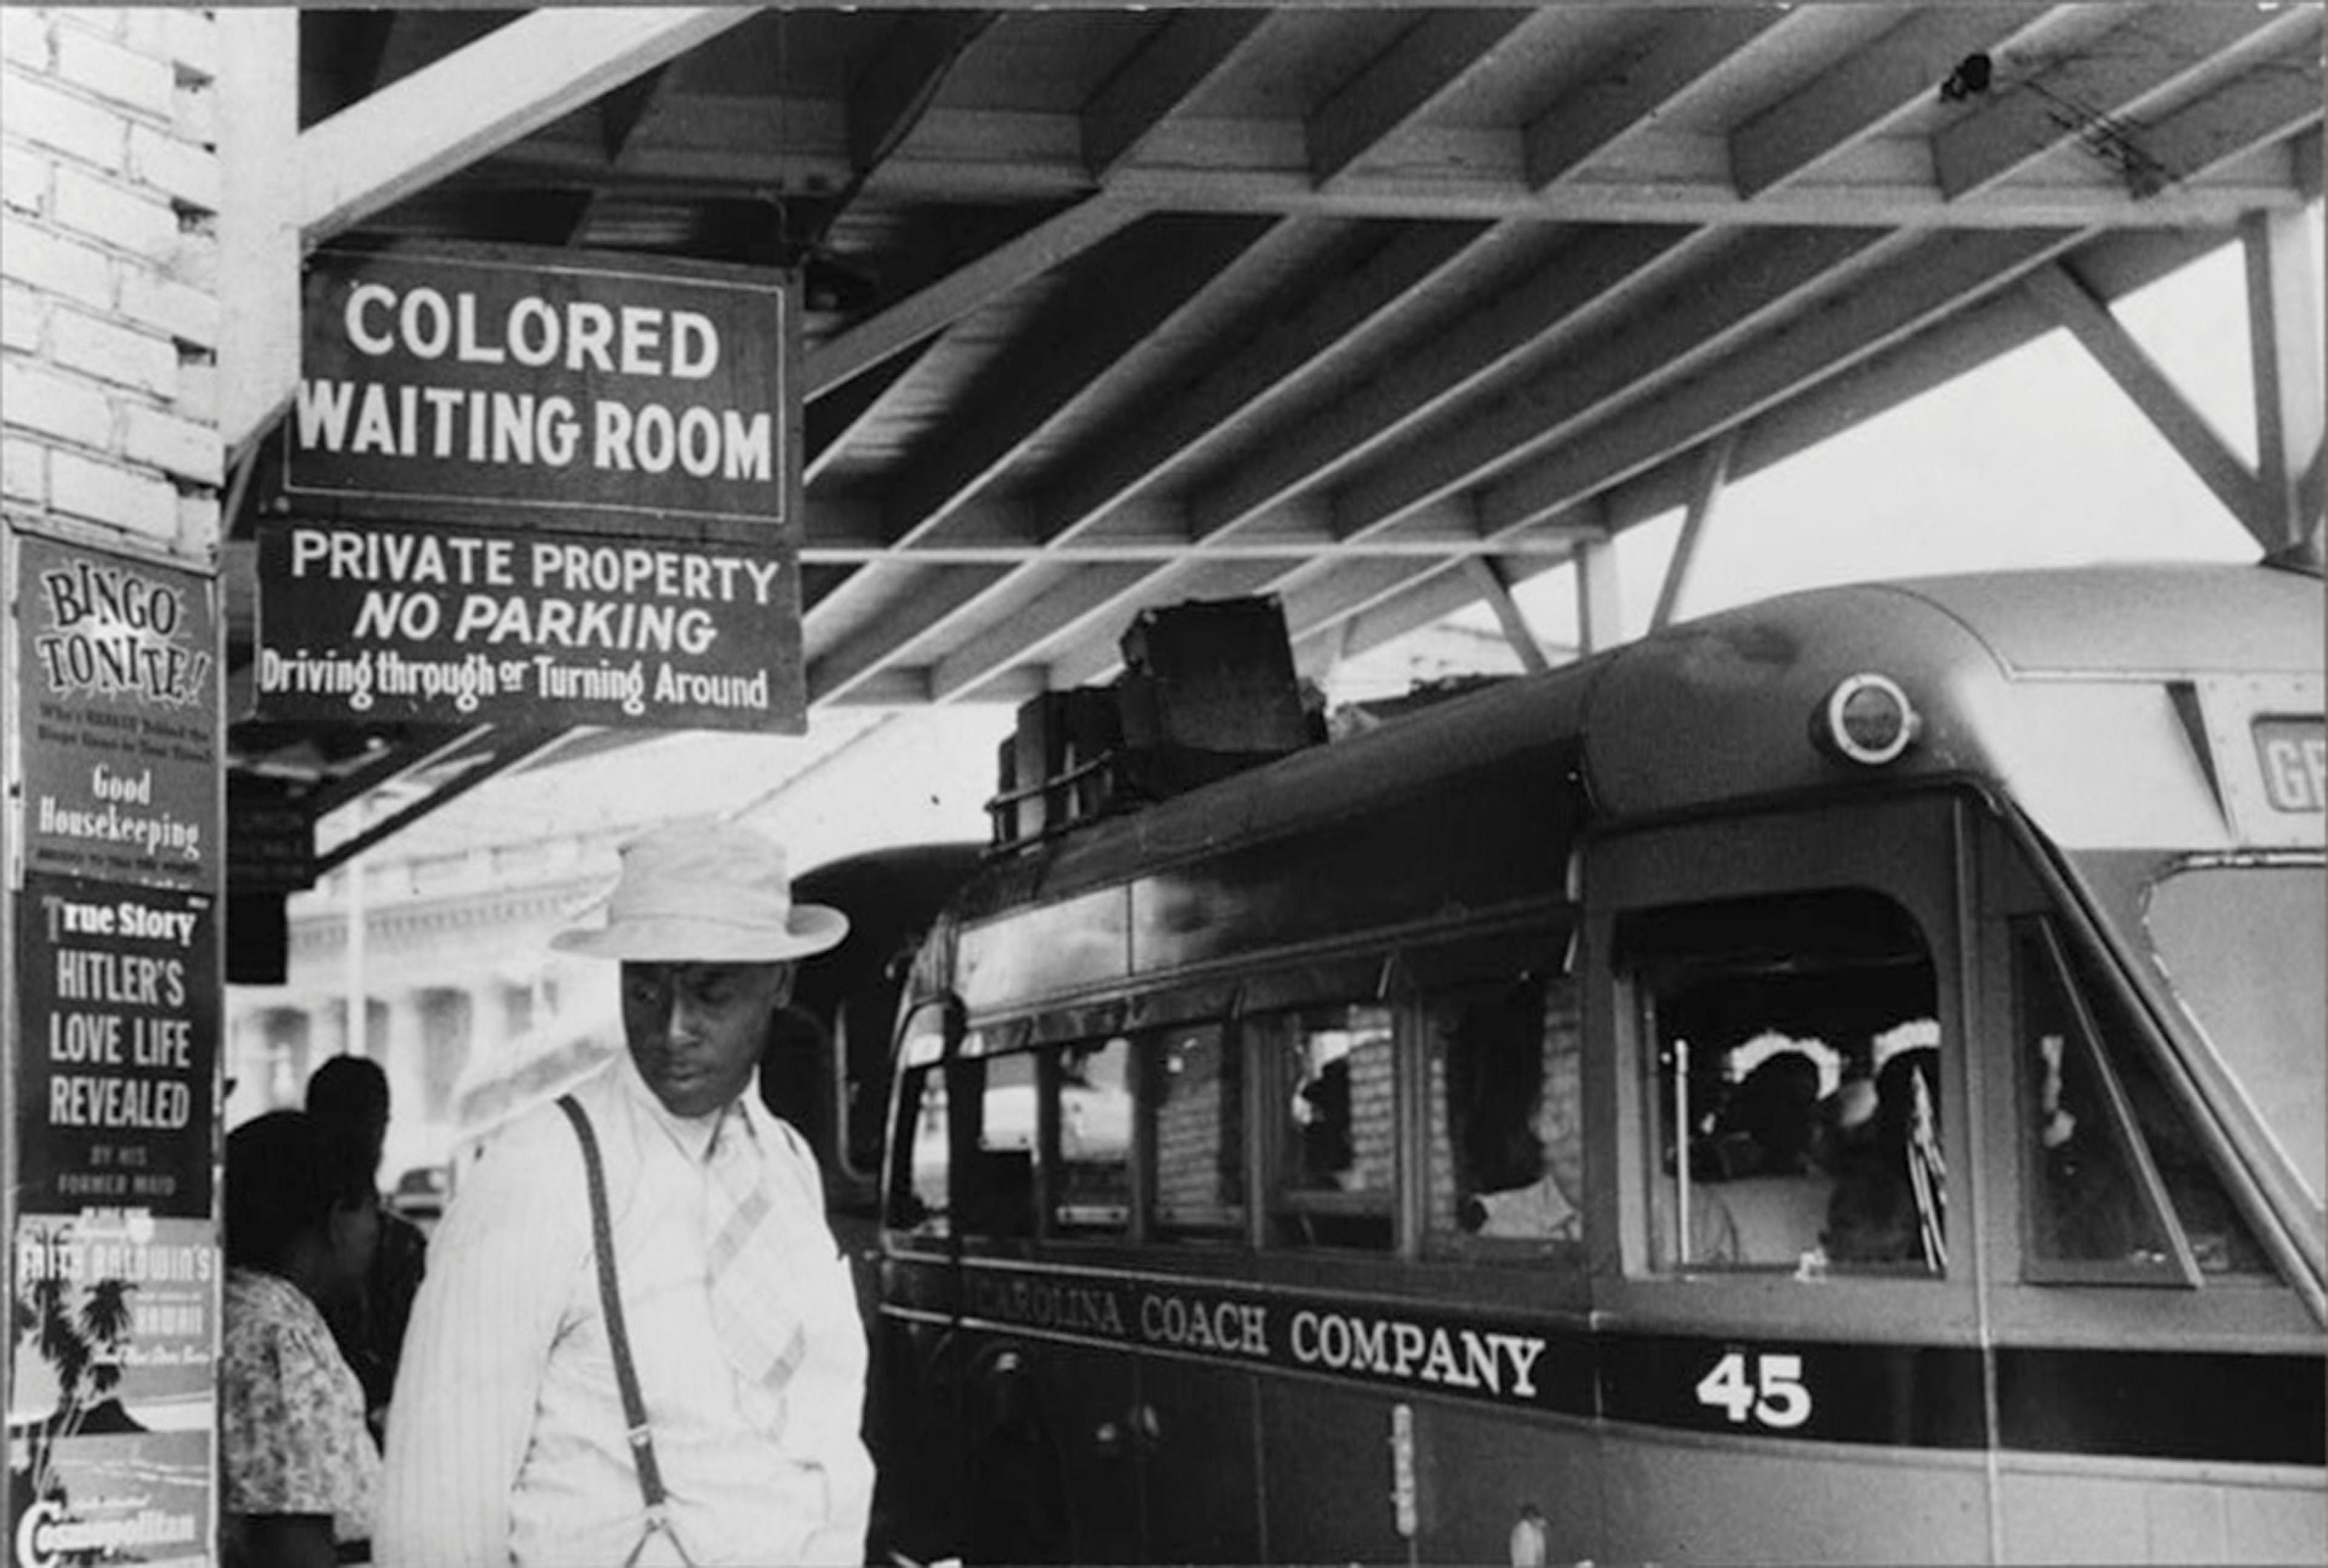 A sign illustrating segregation that reads: